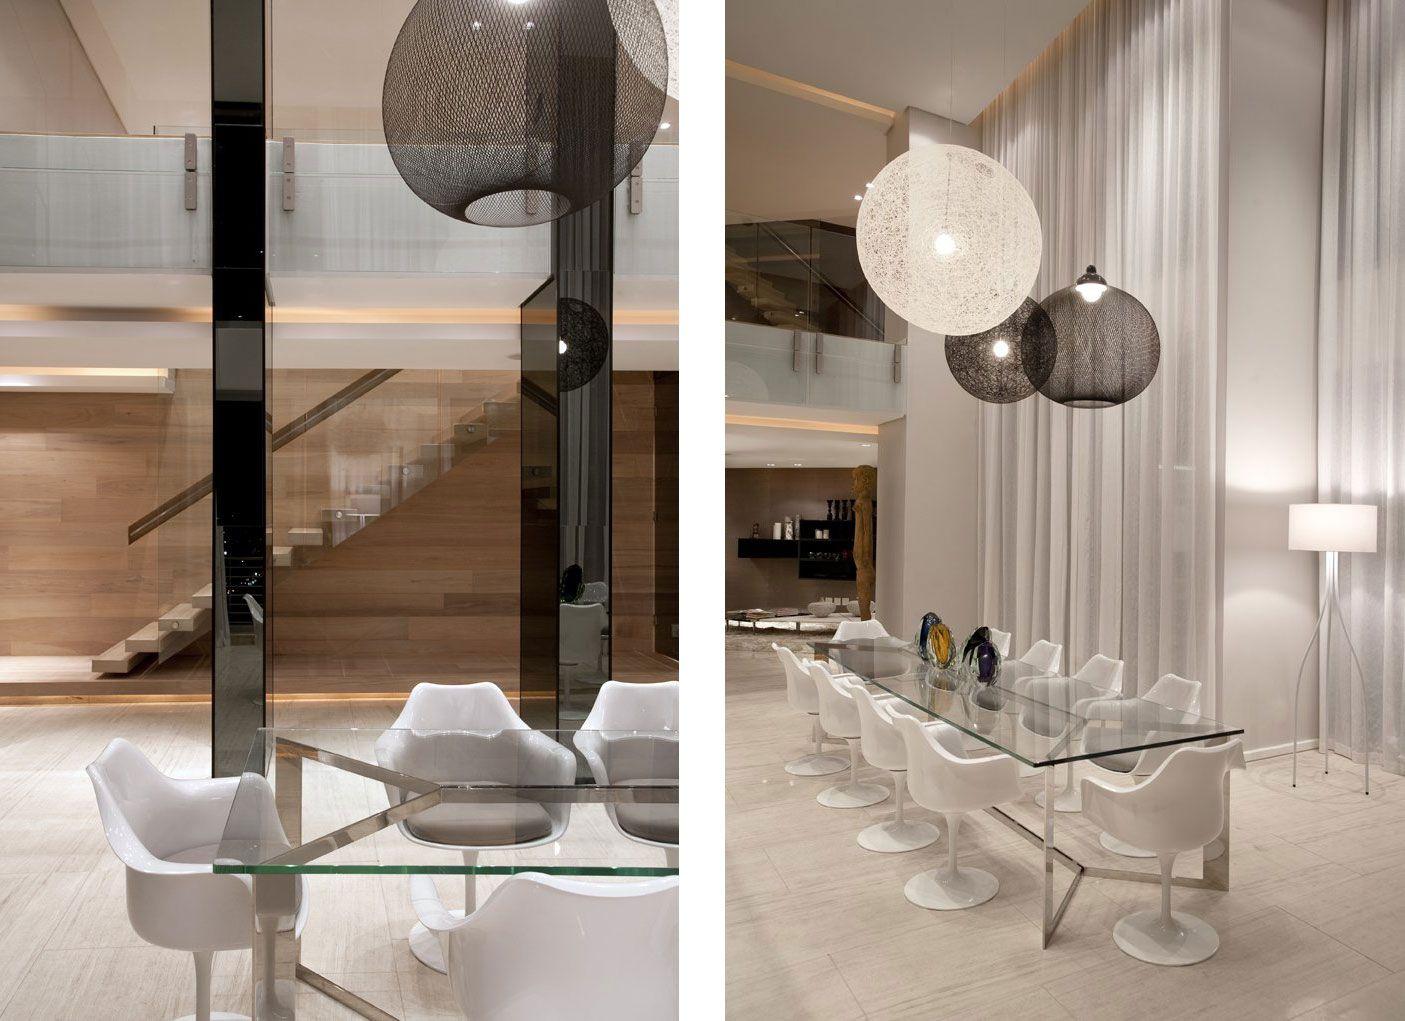 Luxury sandhurst towers penthouse in johannesburg 11